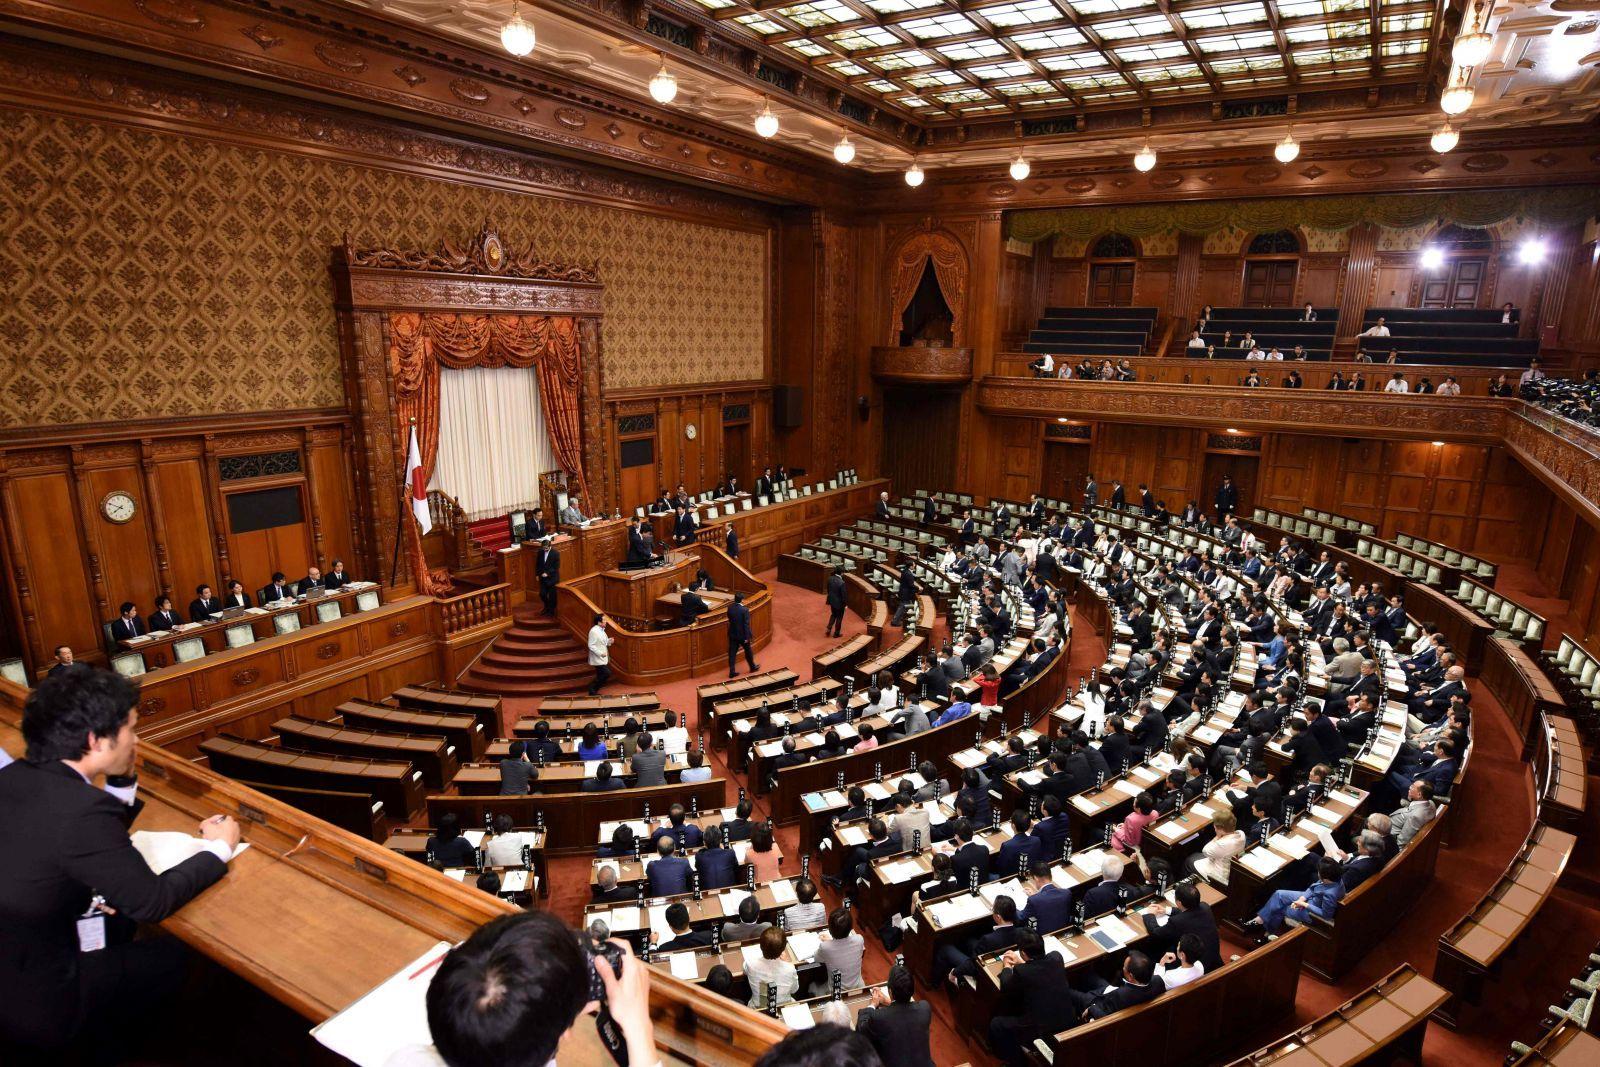 giappone riforma costituzione